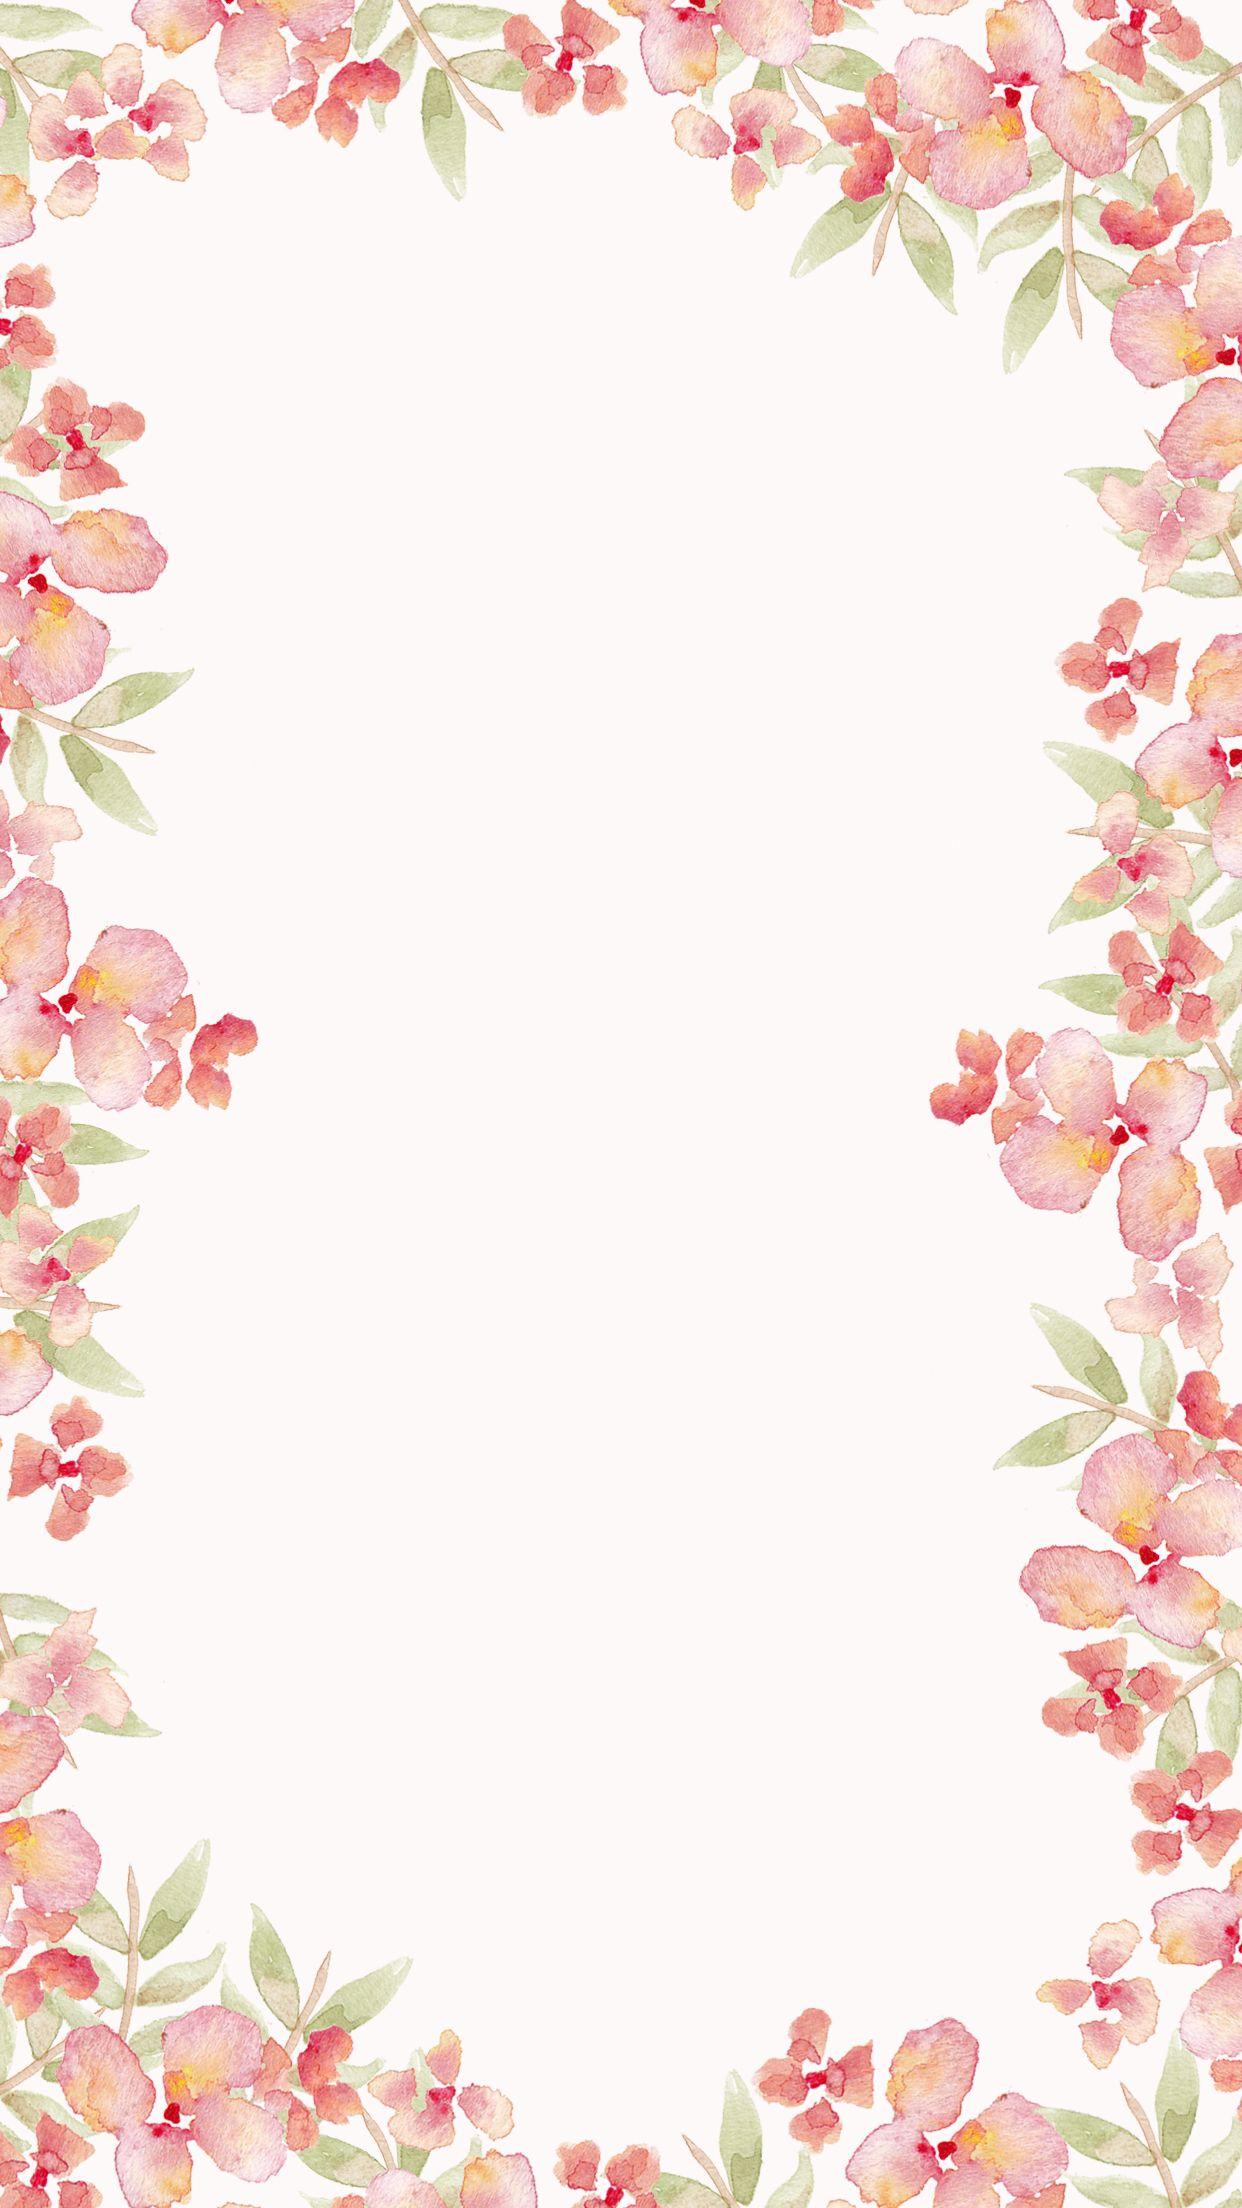 Free February 2017 Desktop And Phone Background Flower Desktop